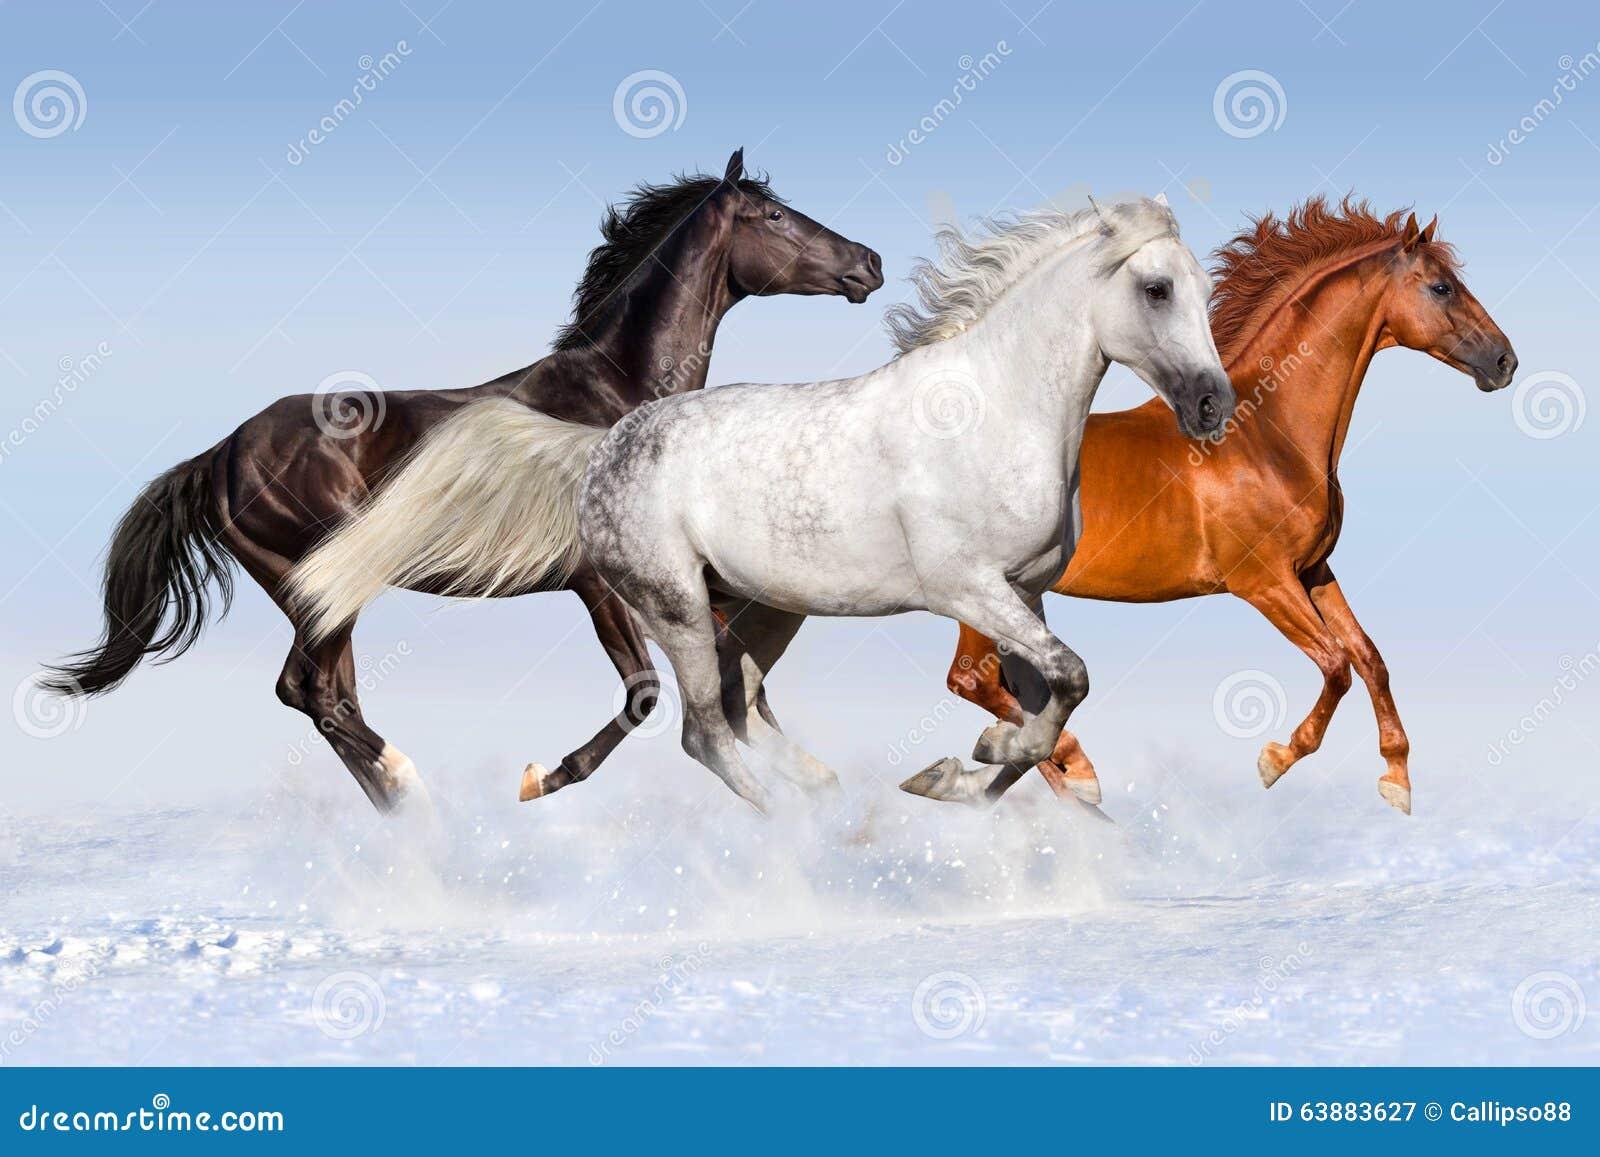 Horse Herd Run In Winter Stock Image Image Of Stallion 63883627